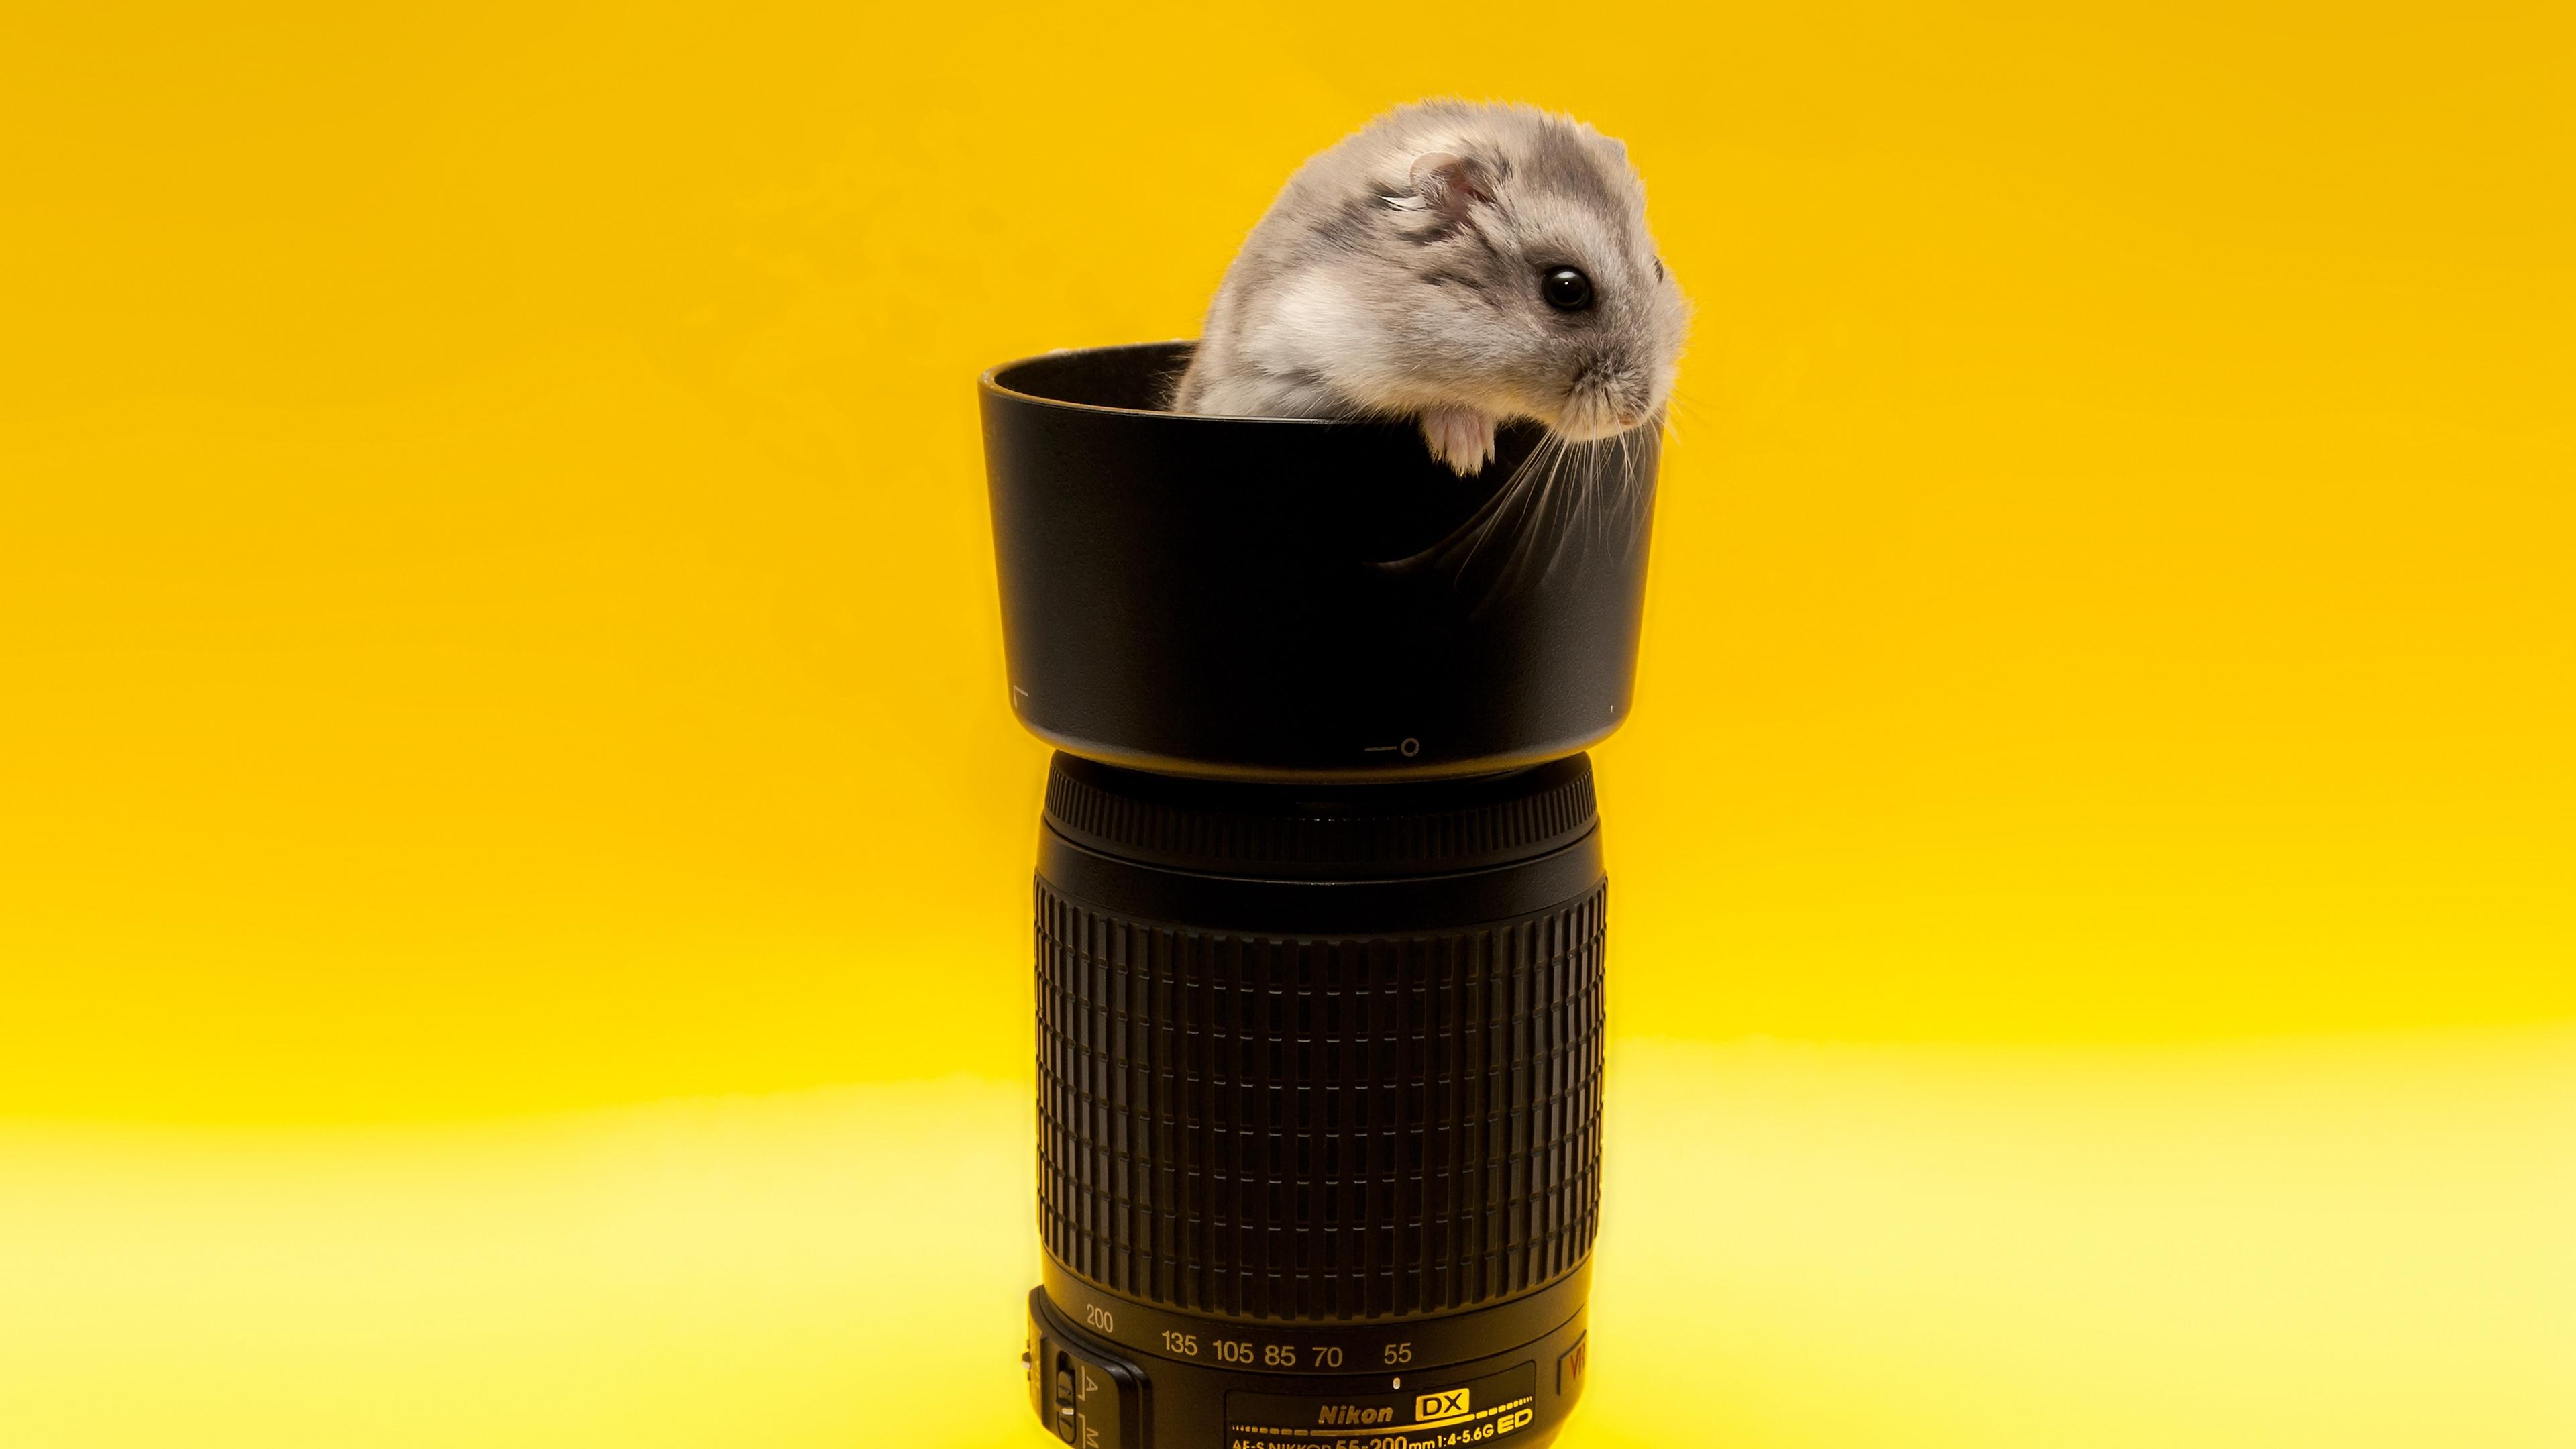 mouse lens climb rodent 4k 1542242162 - mouse, lens, climb, rodent 4k - Mouse, lens, climb